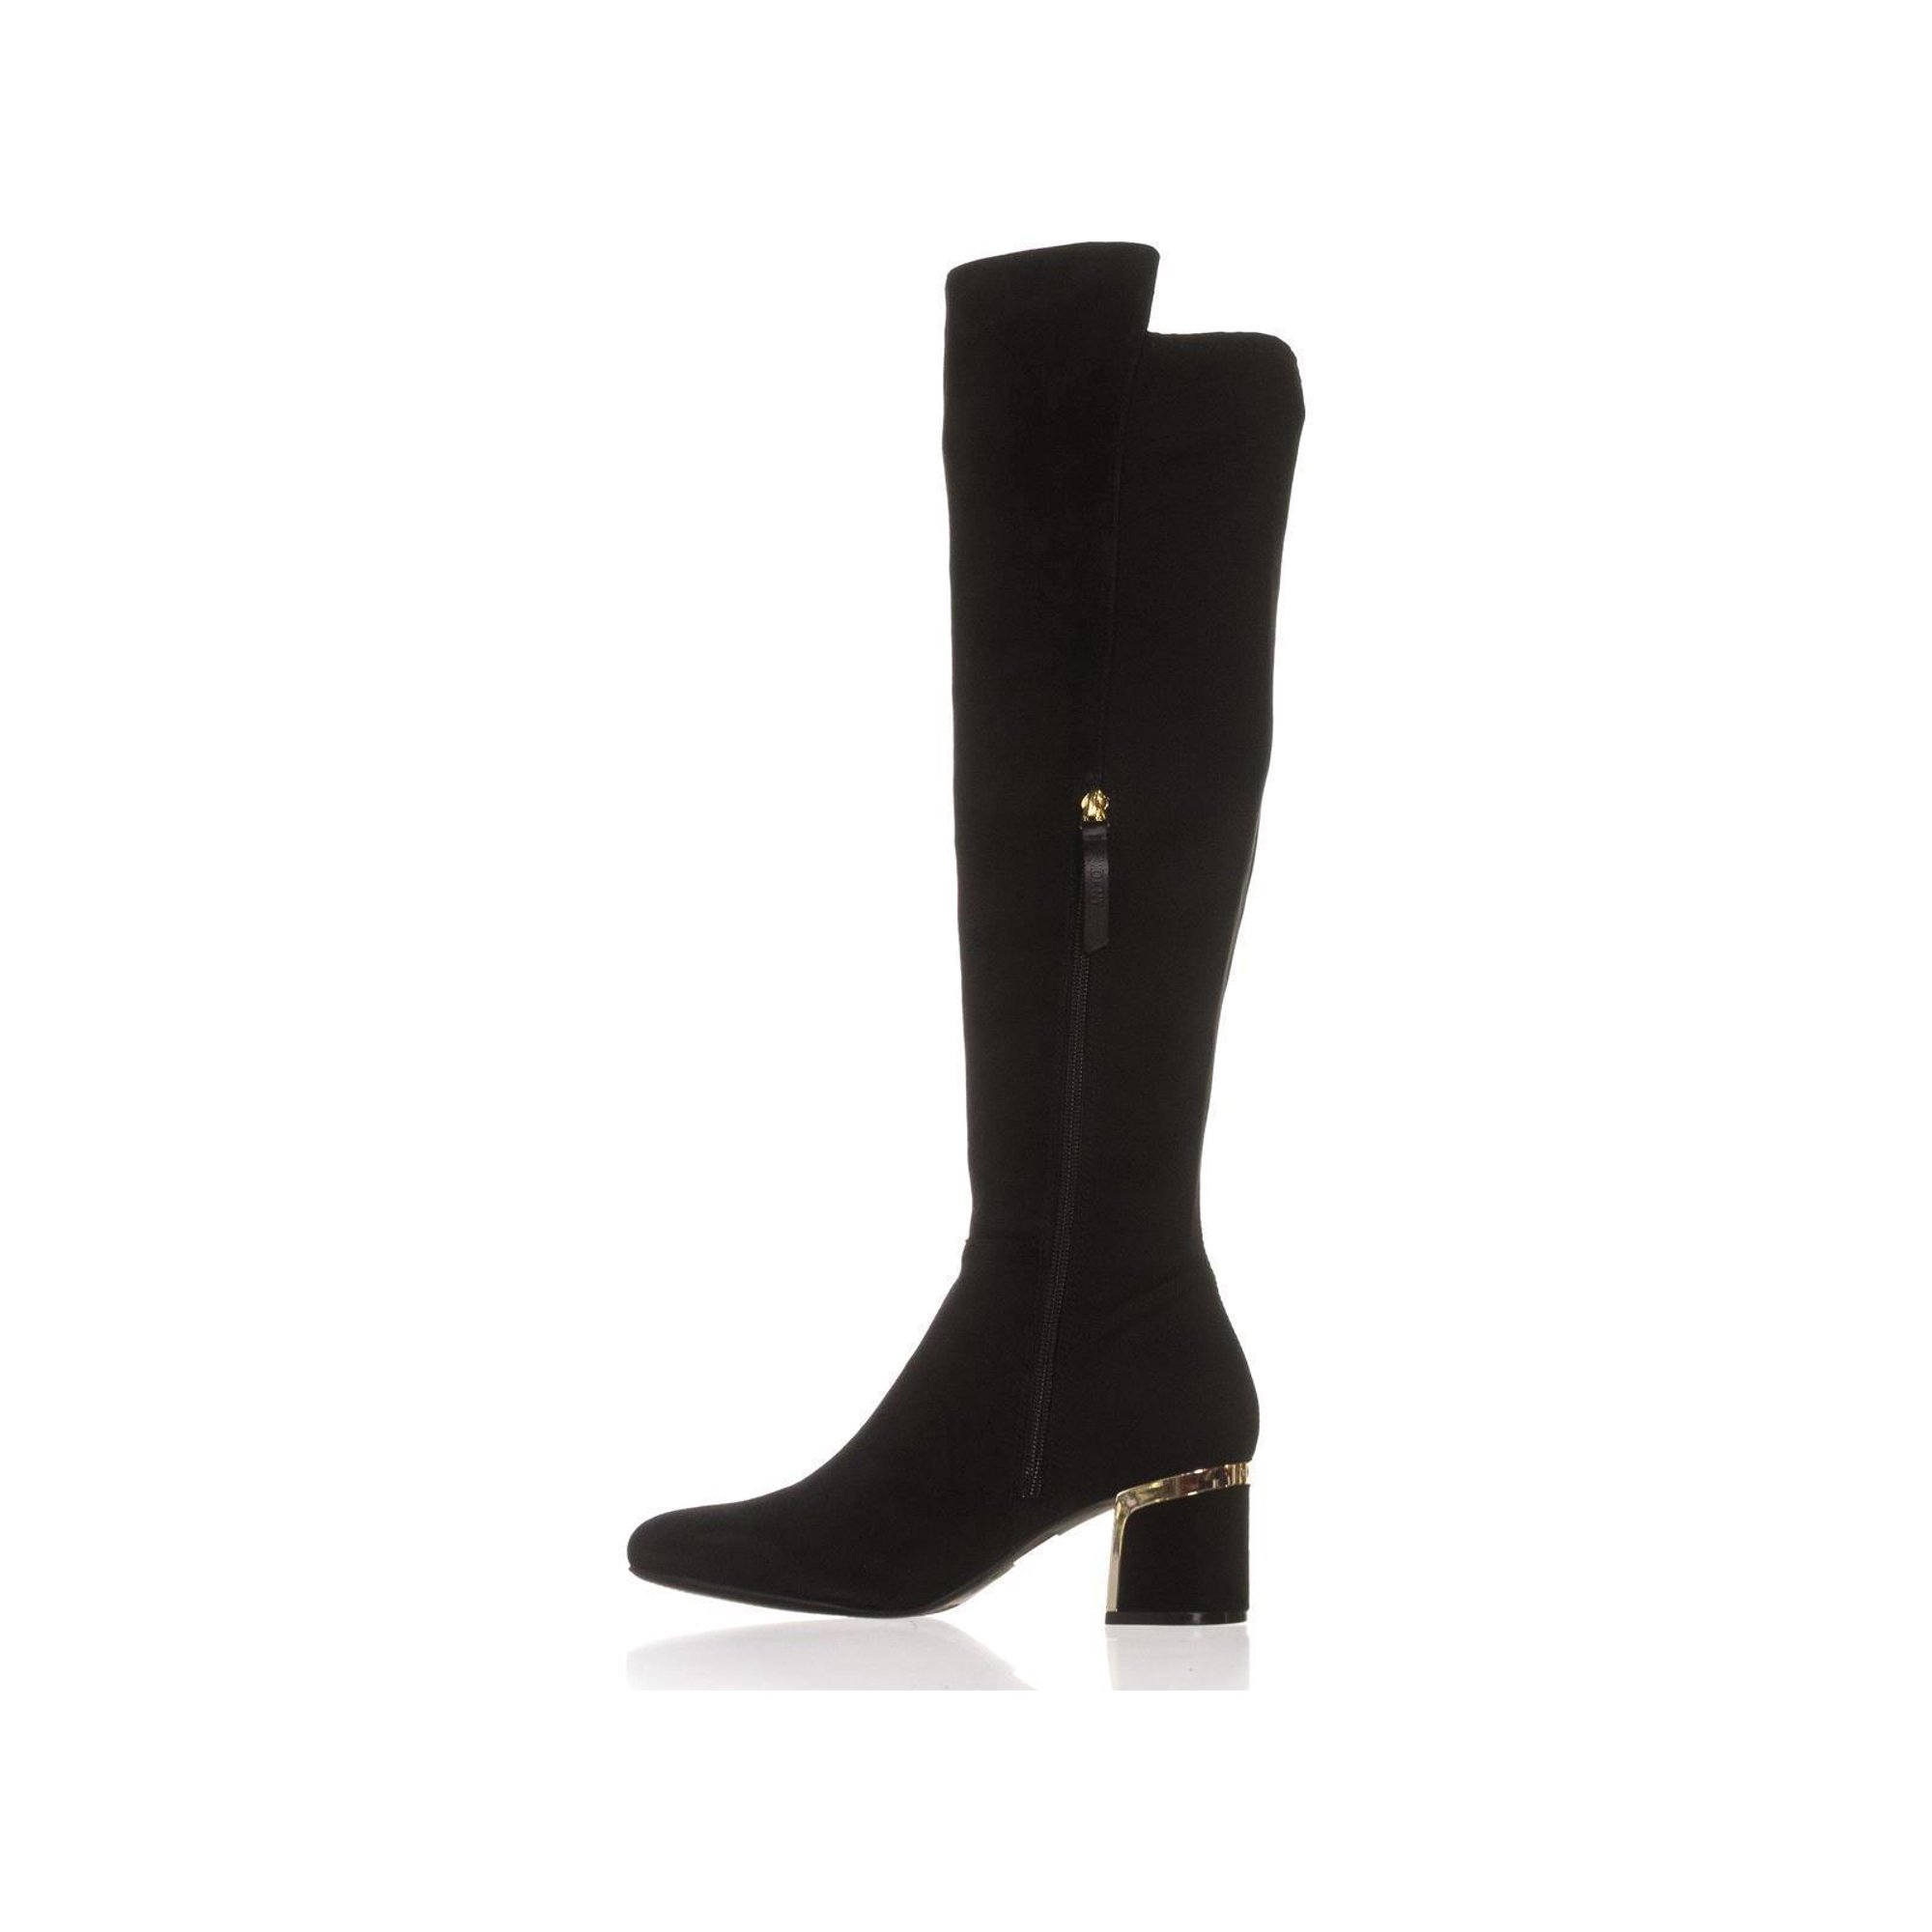 4d4fc0f8695 DKNY Cora Knee High Boots